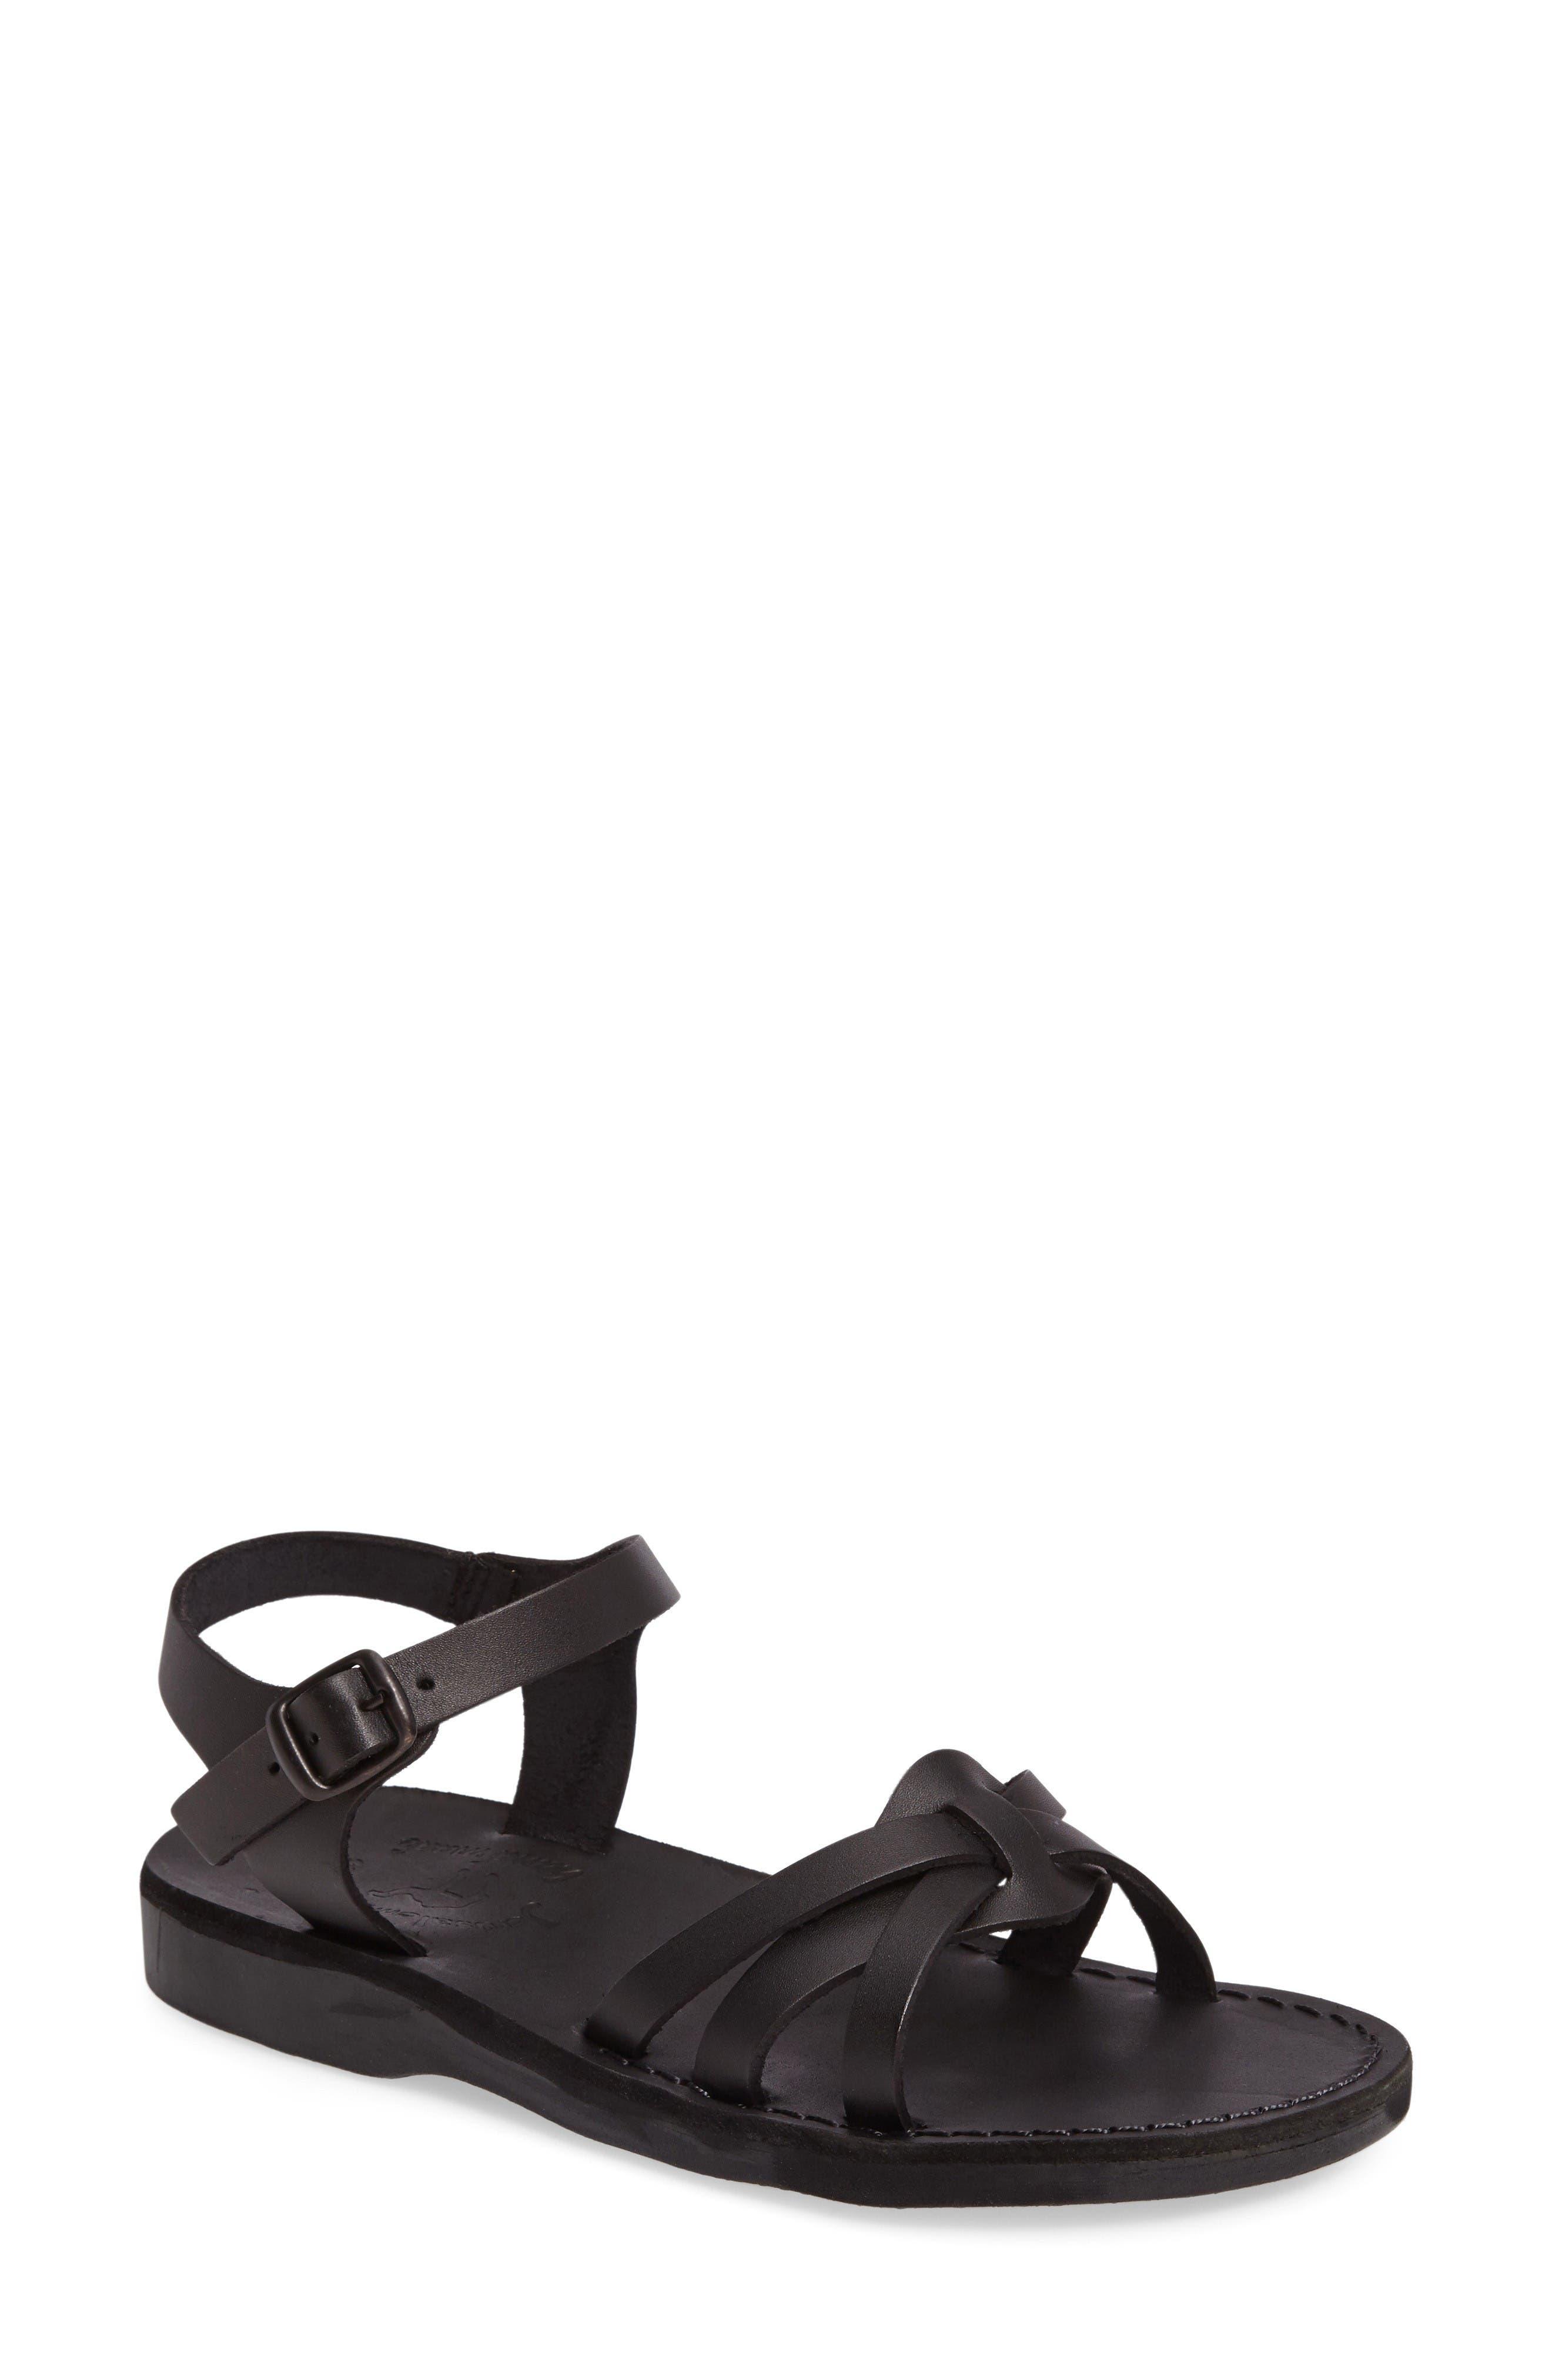 Miriam Sandal,                         Main,                         color, Black Leather